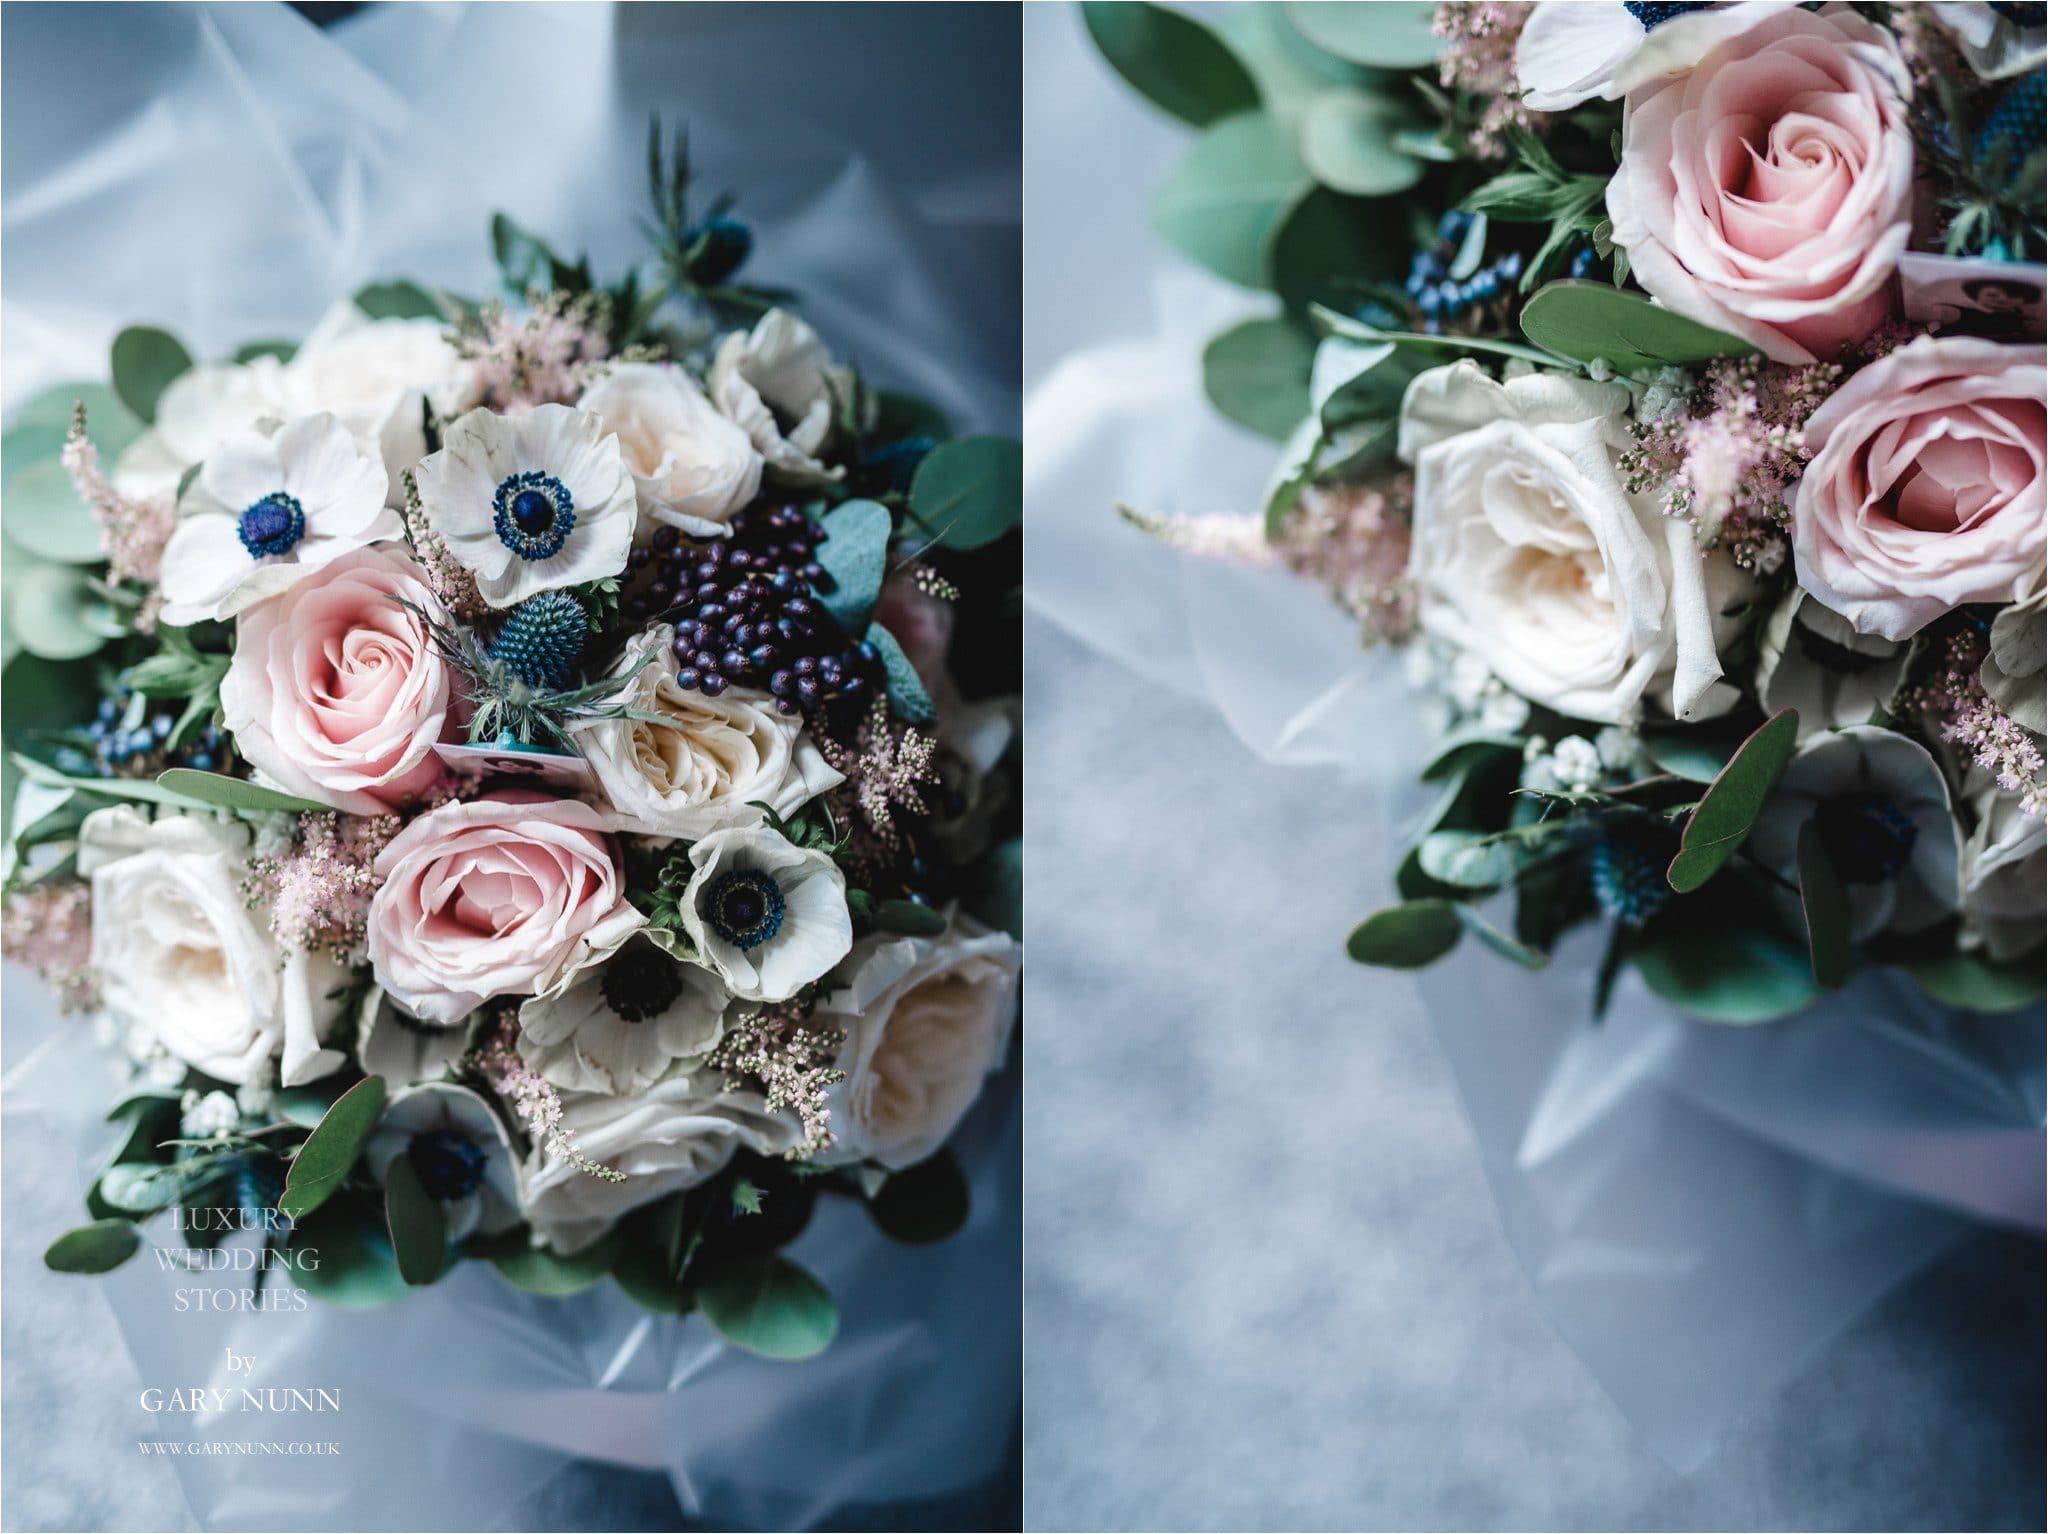 Chicheley Hall Weddings, wedding photographer Milton Keynes, Wedding Photographer Leighton Buzzard, wedding photographer Bedfordshire, destination wedding photographer